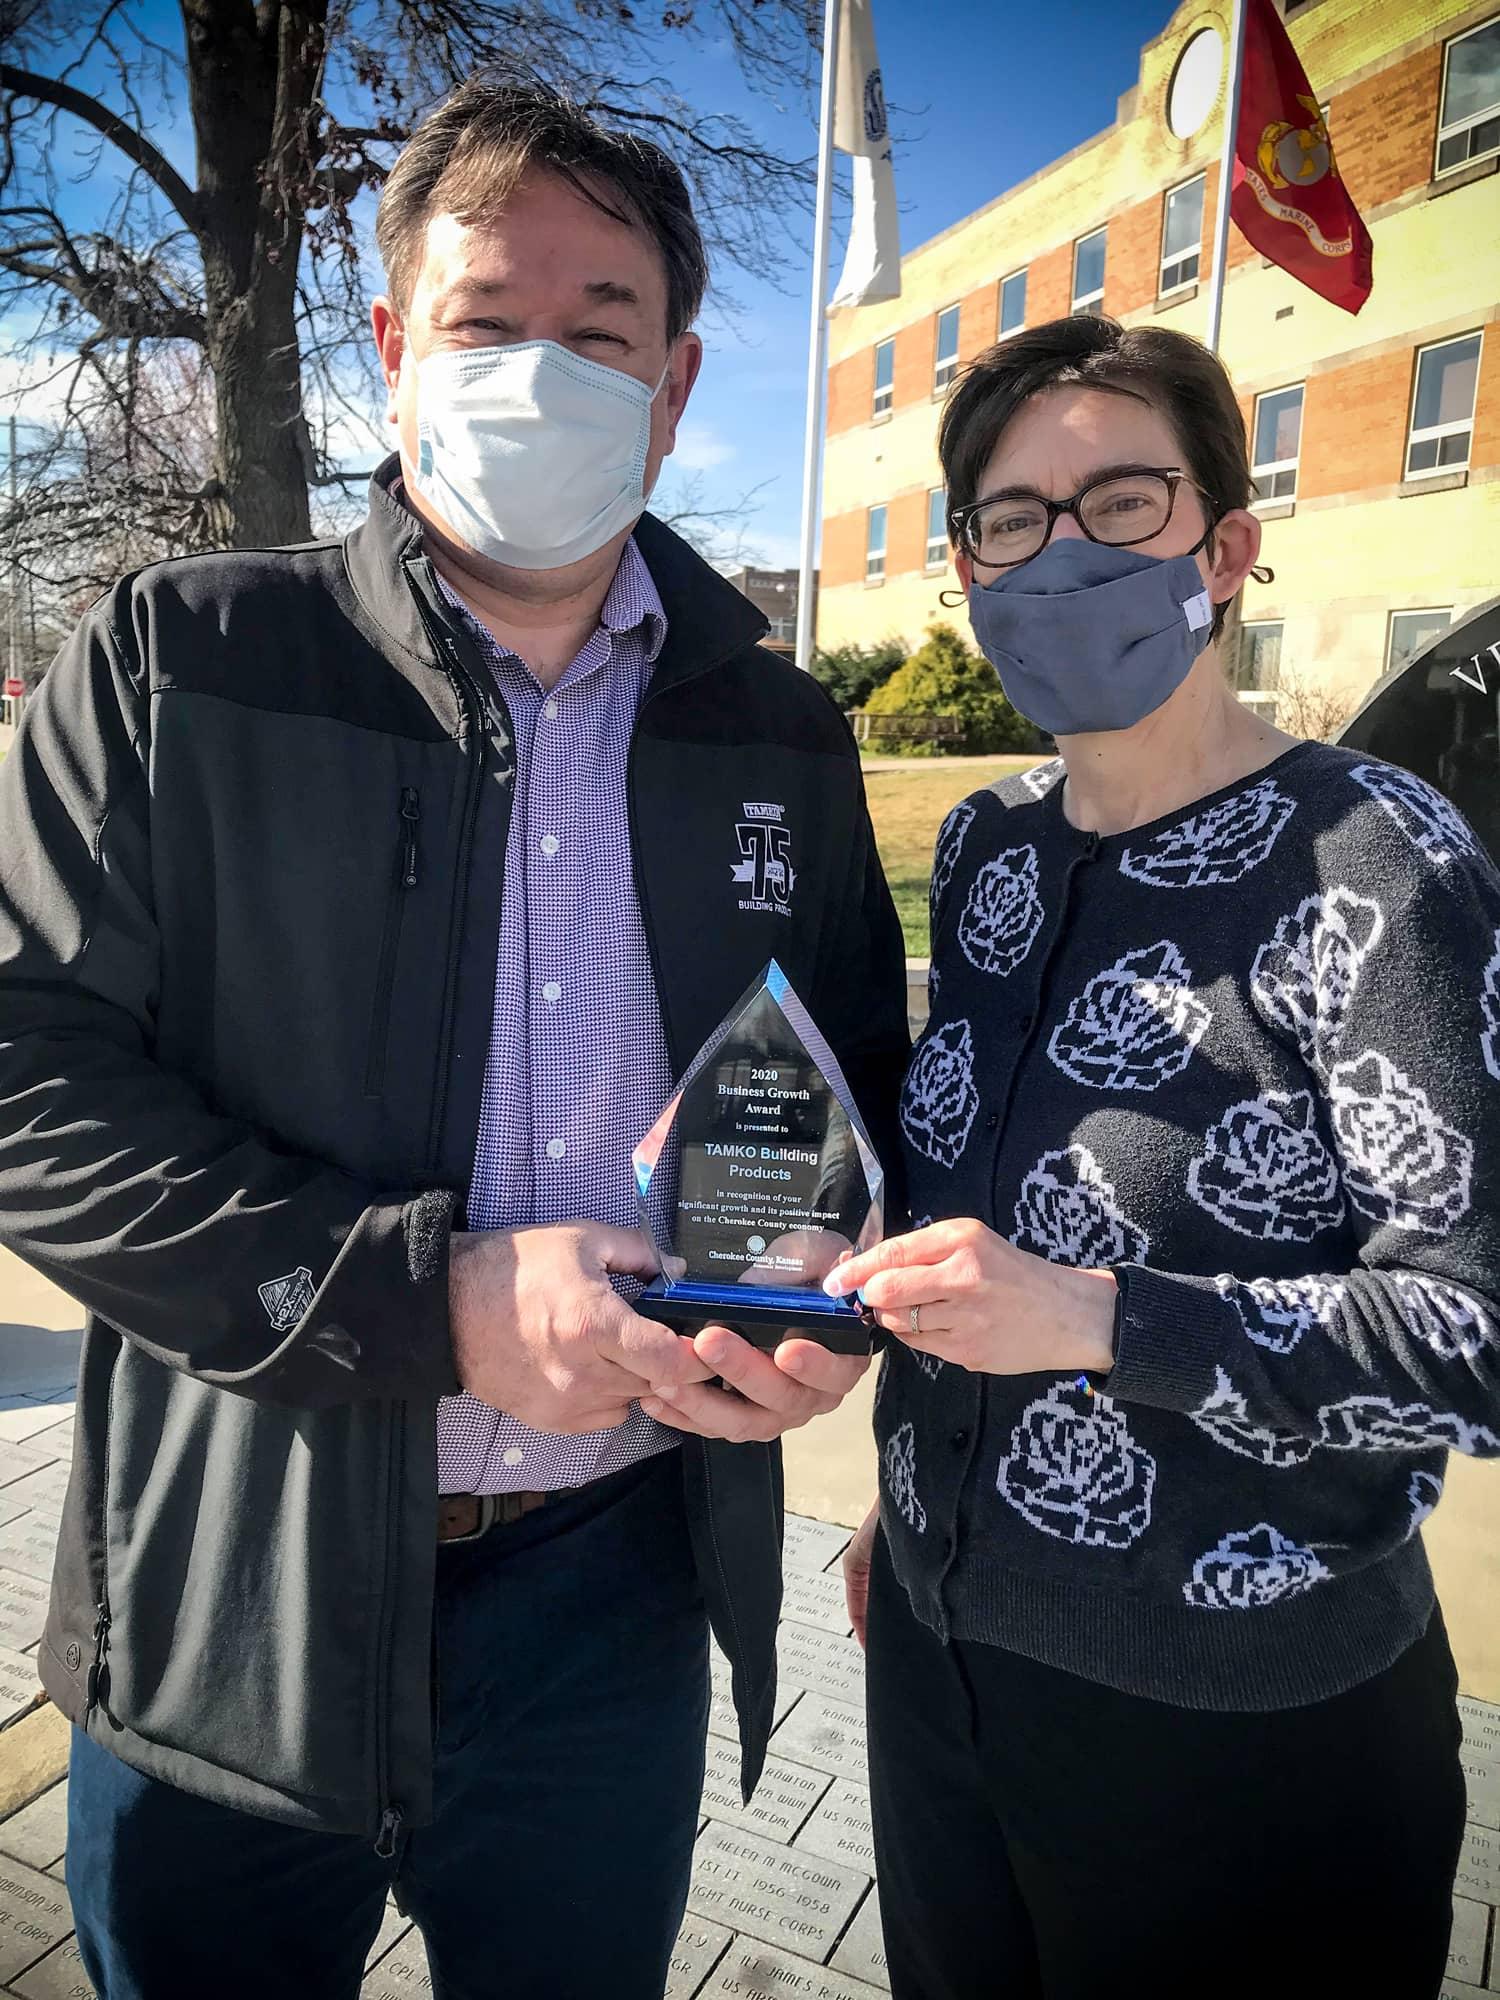 TAMKO Award Presentation - Columbus KS Community Award 2020